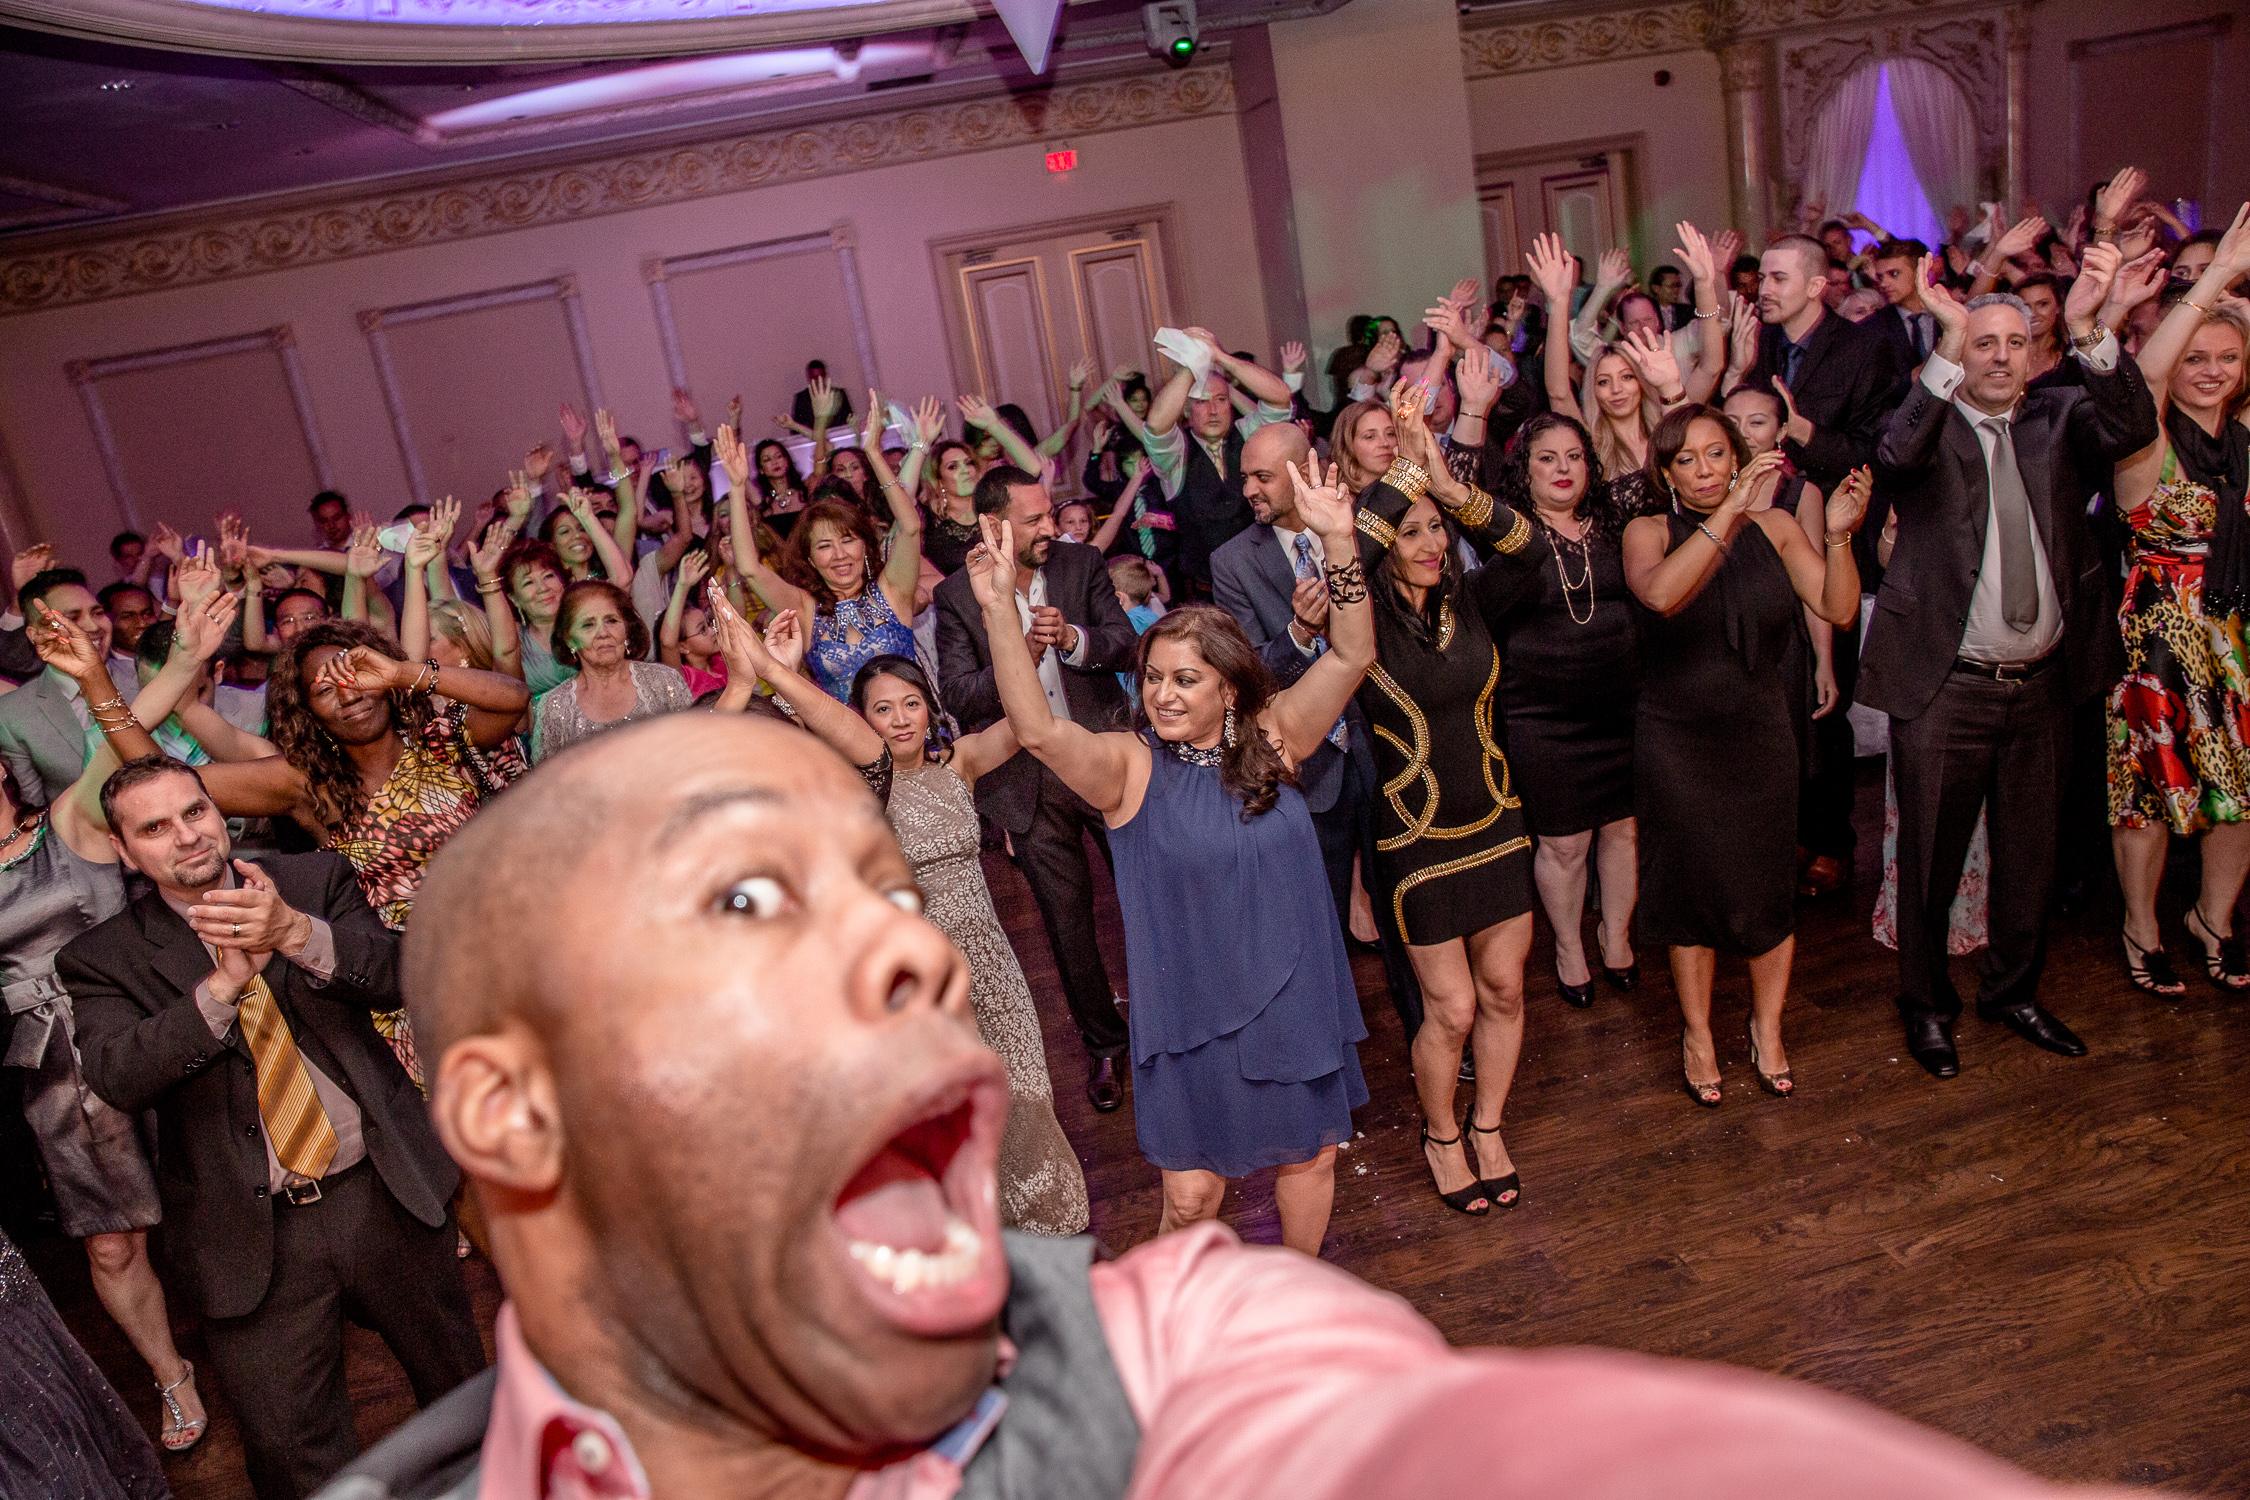 Paradise-Banquet-Hall-Wedding-Vaughan-Ontario-0087.jpg